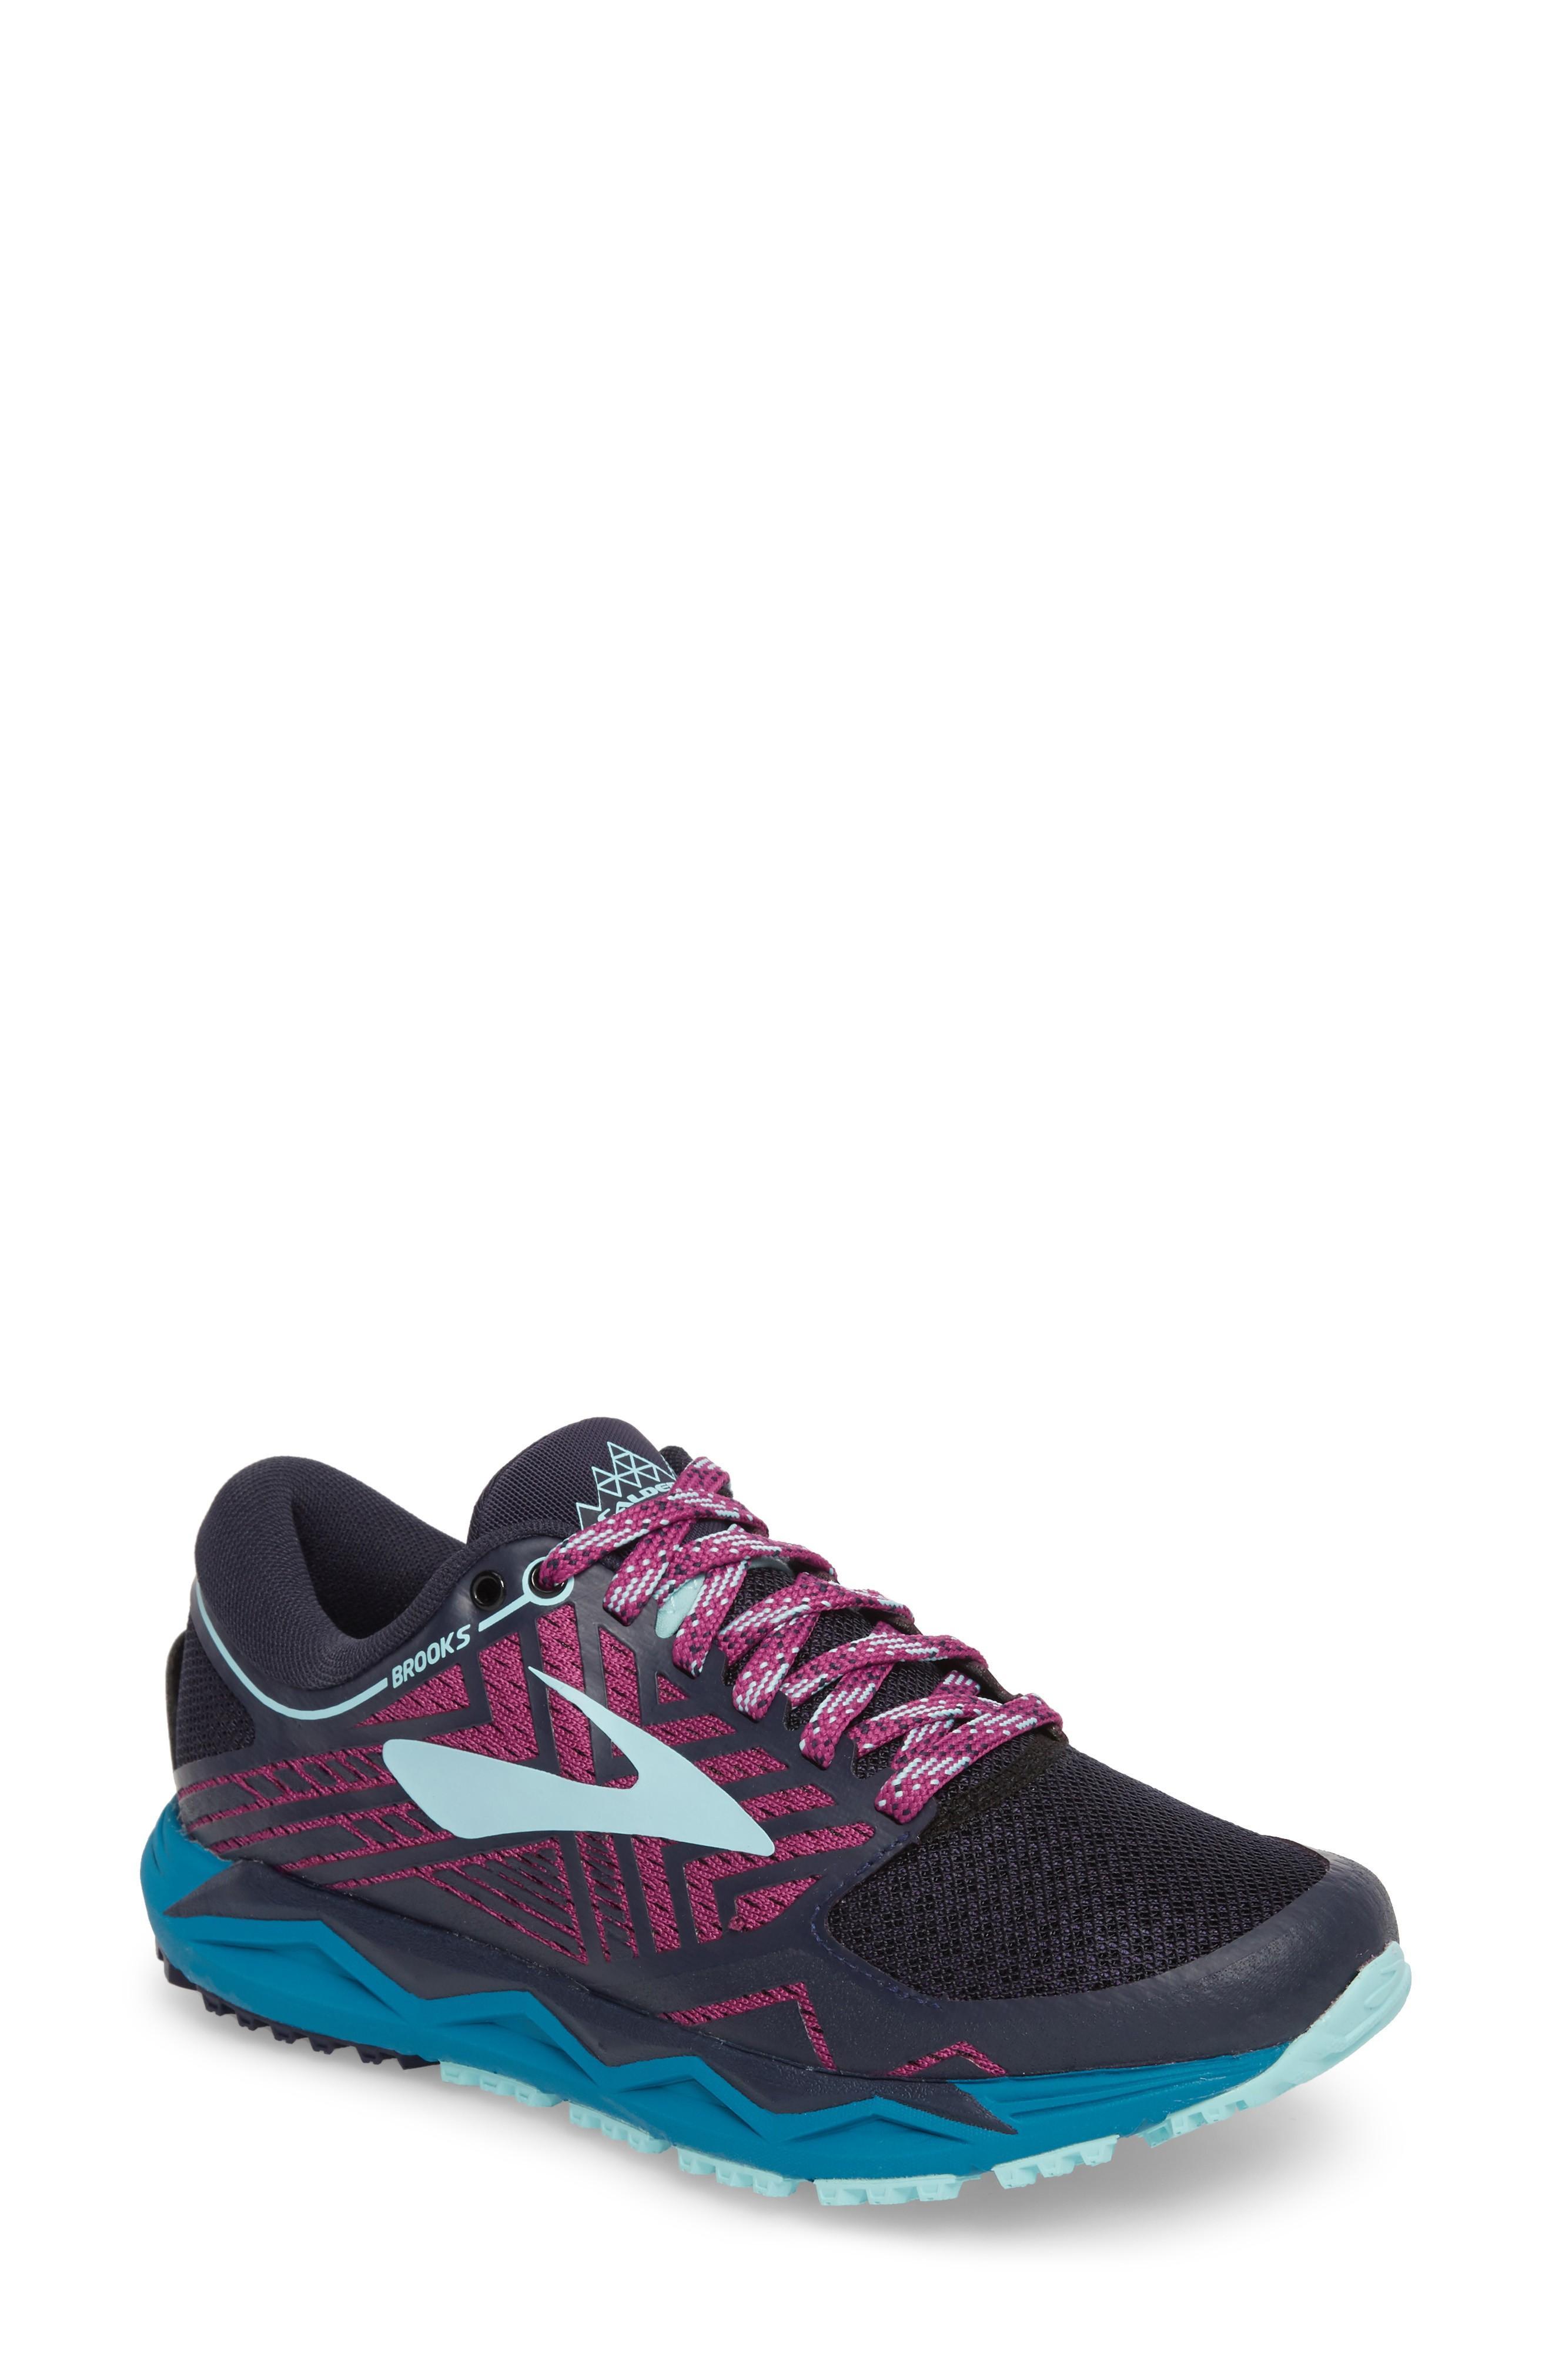 7689695d5b3 Brooks Caldera 2 Trail Running Shoe In Navy  Plum  Ice Blue